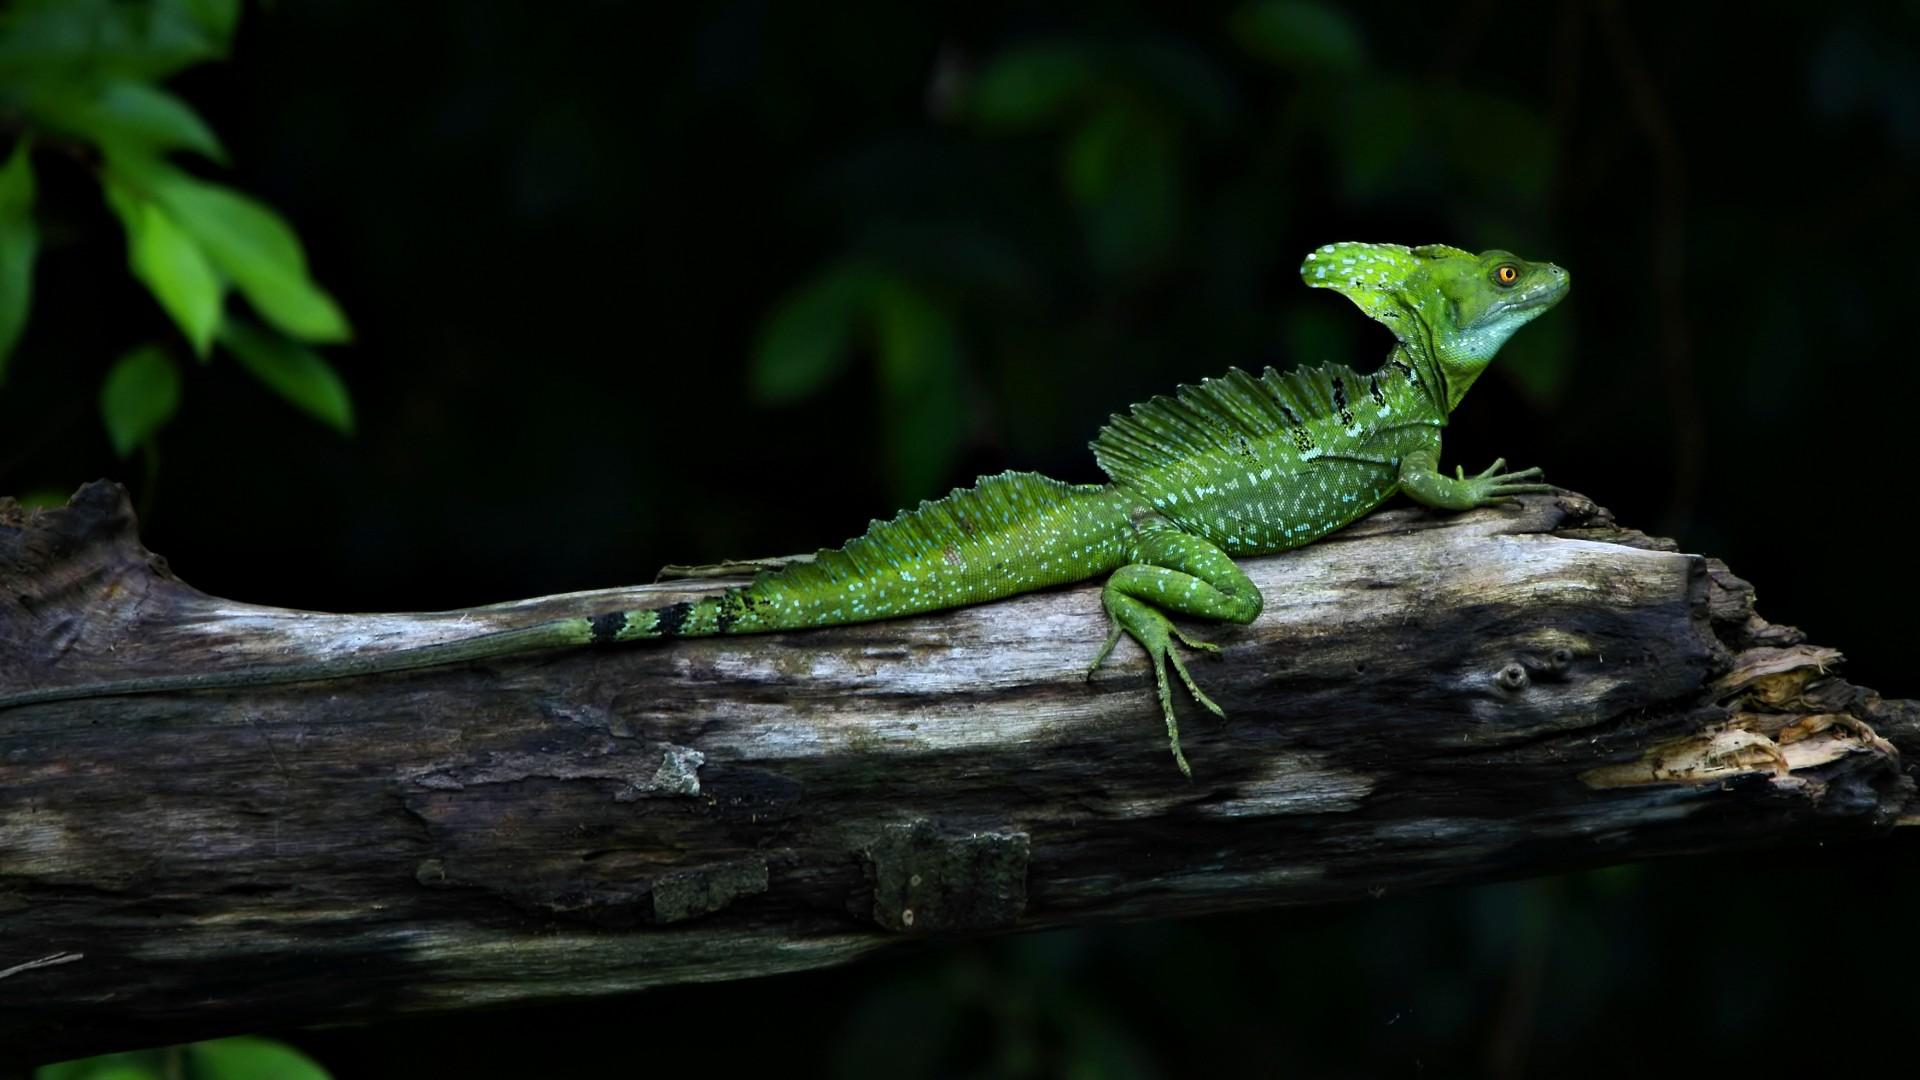 image of a lizard